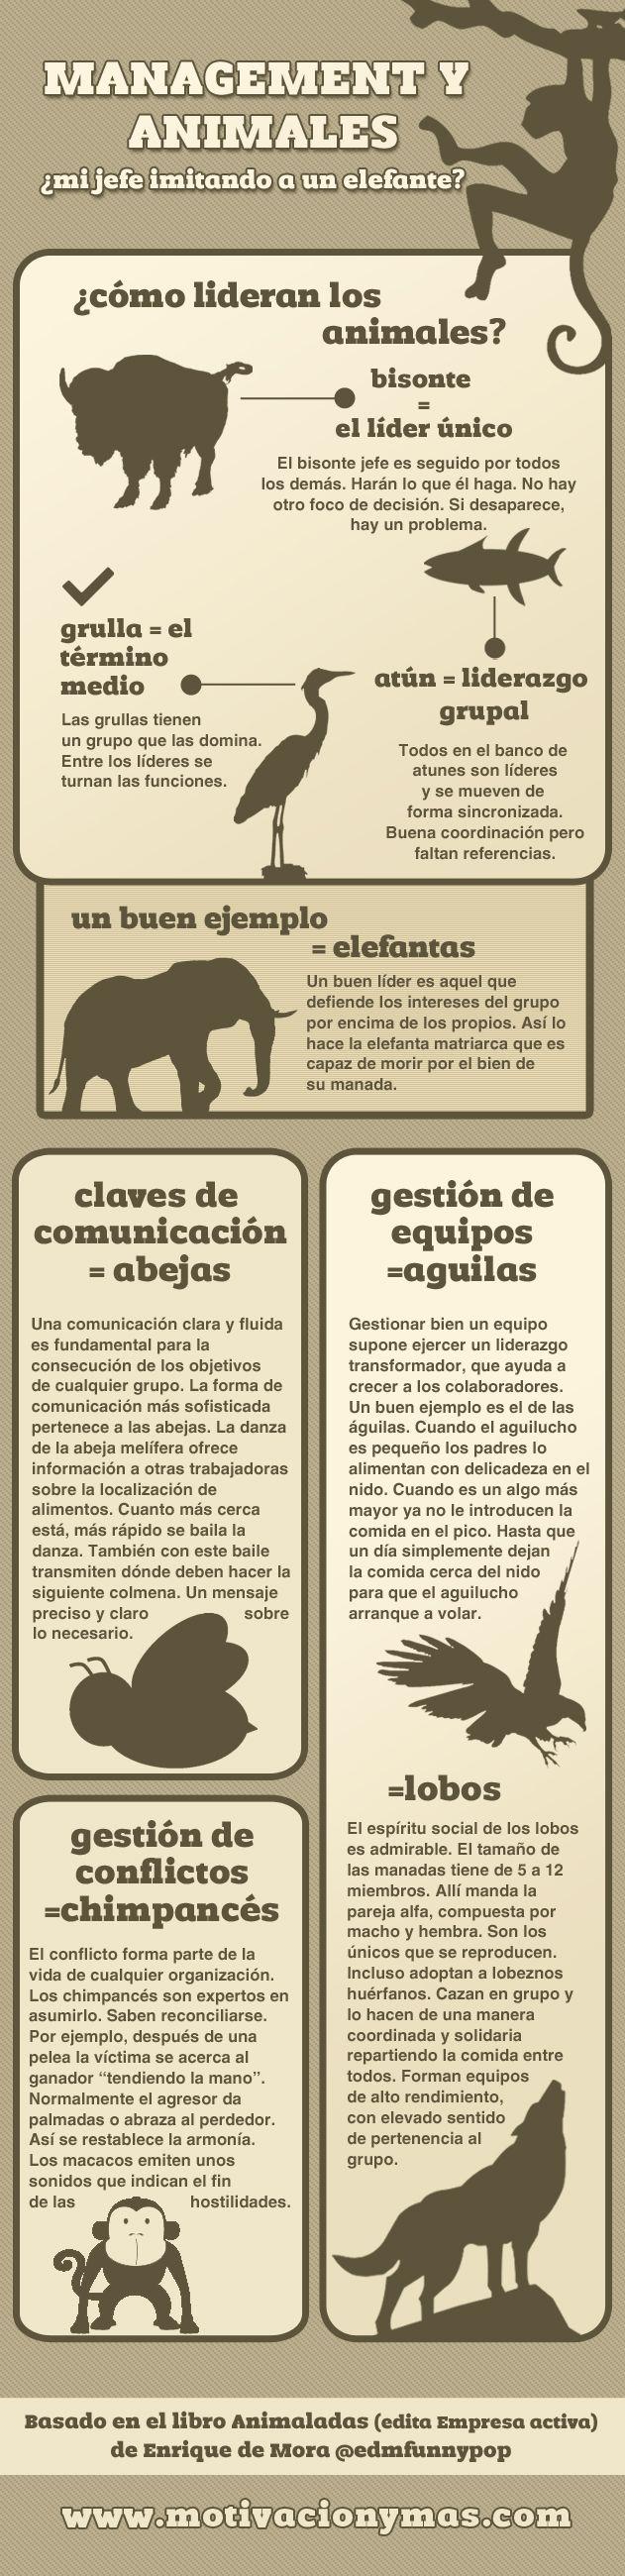 Mangement y animales #infografia